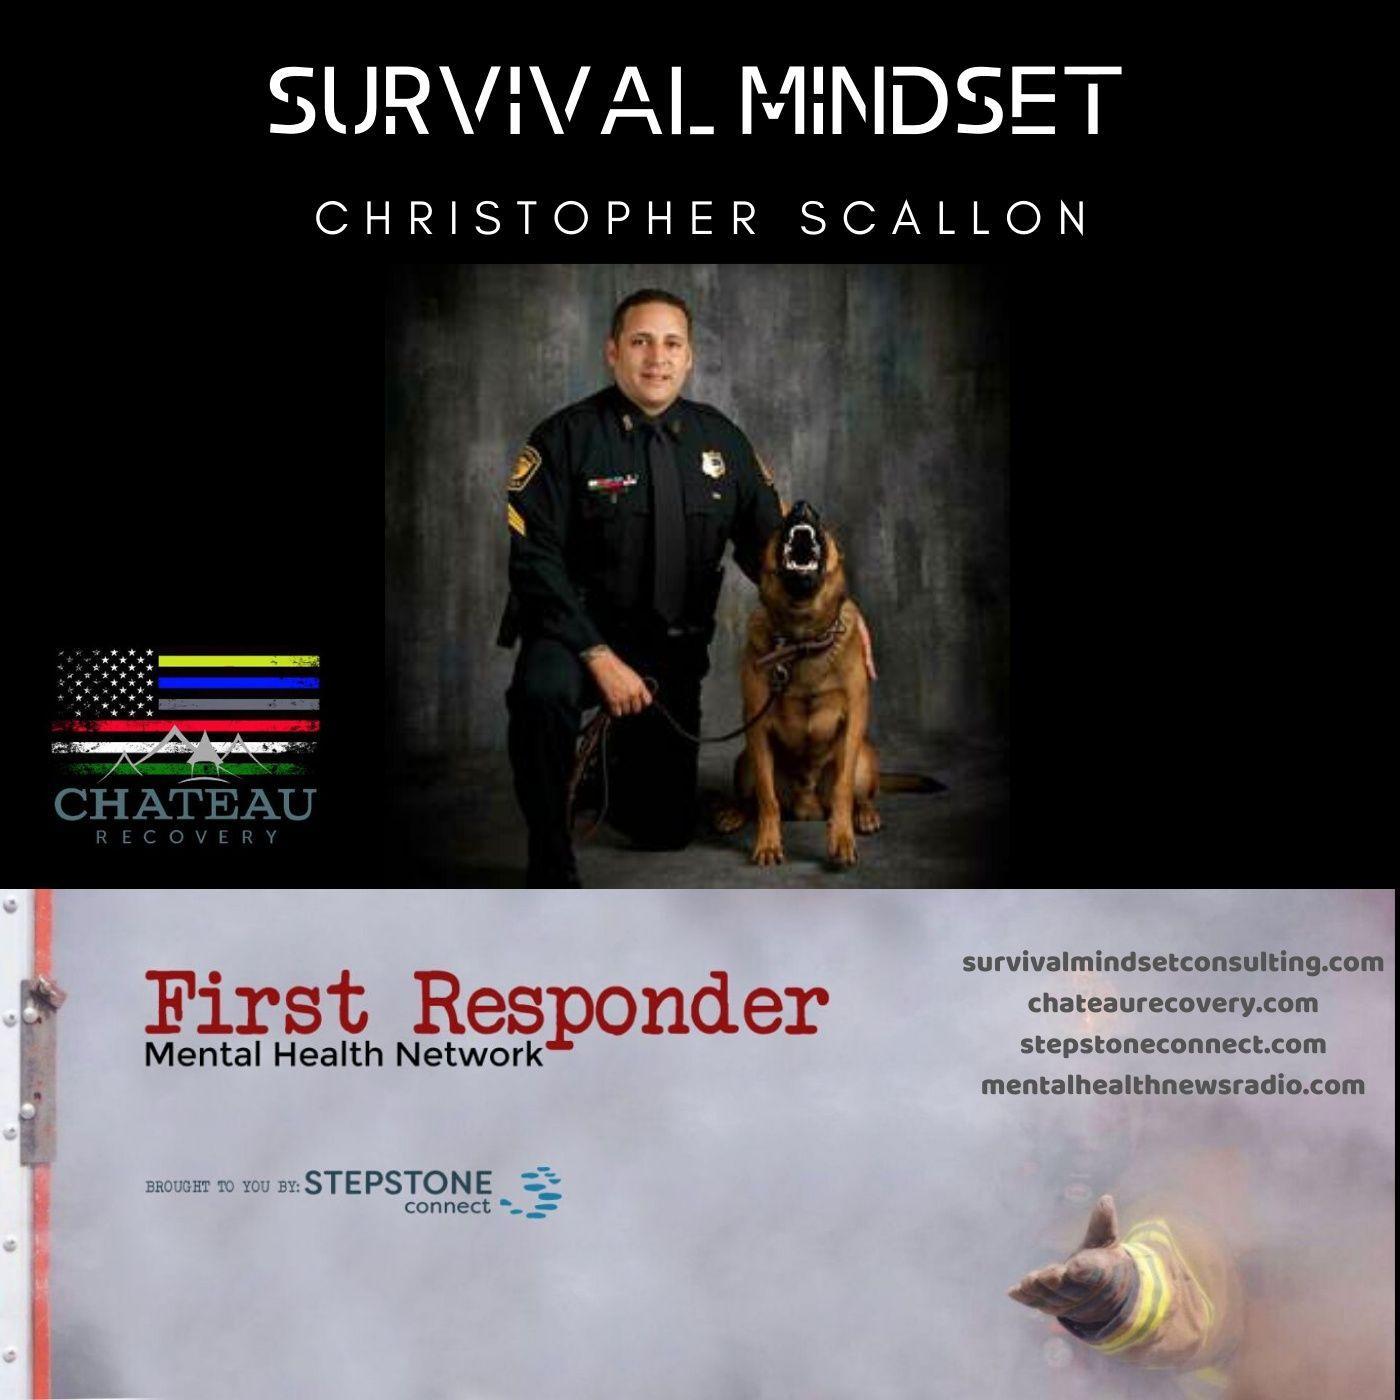 Mental Health News Radio - First Responders: Survival Mindset